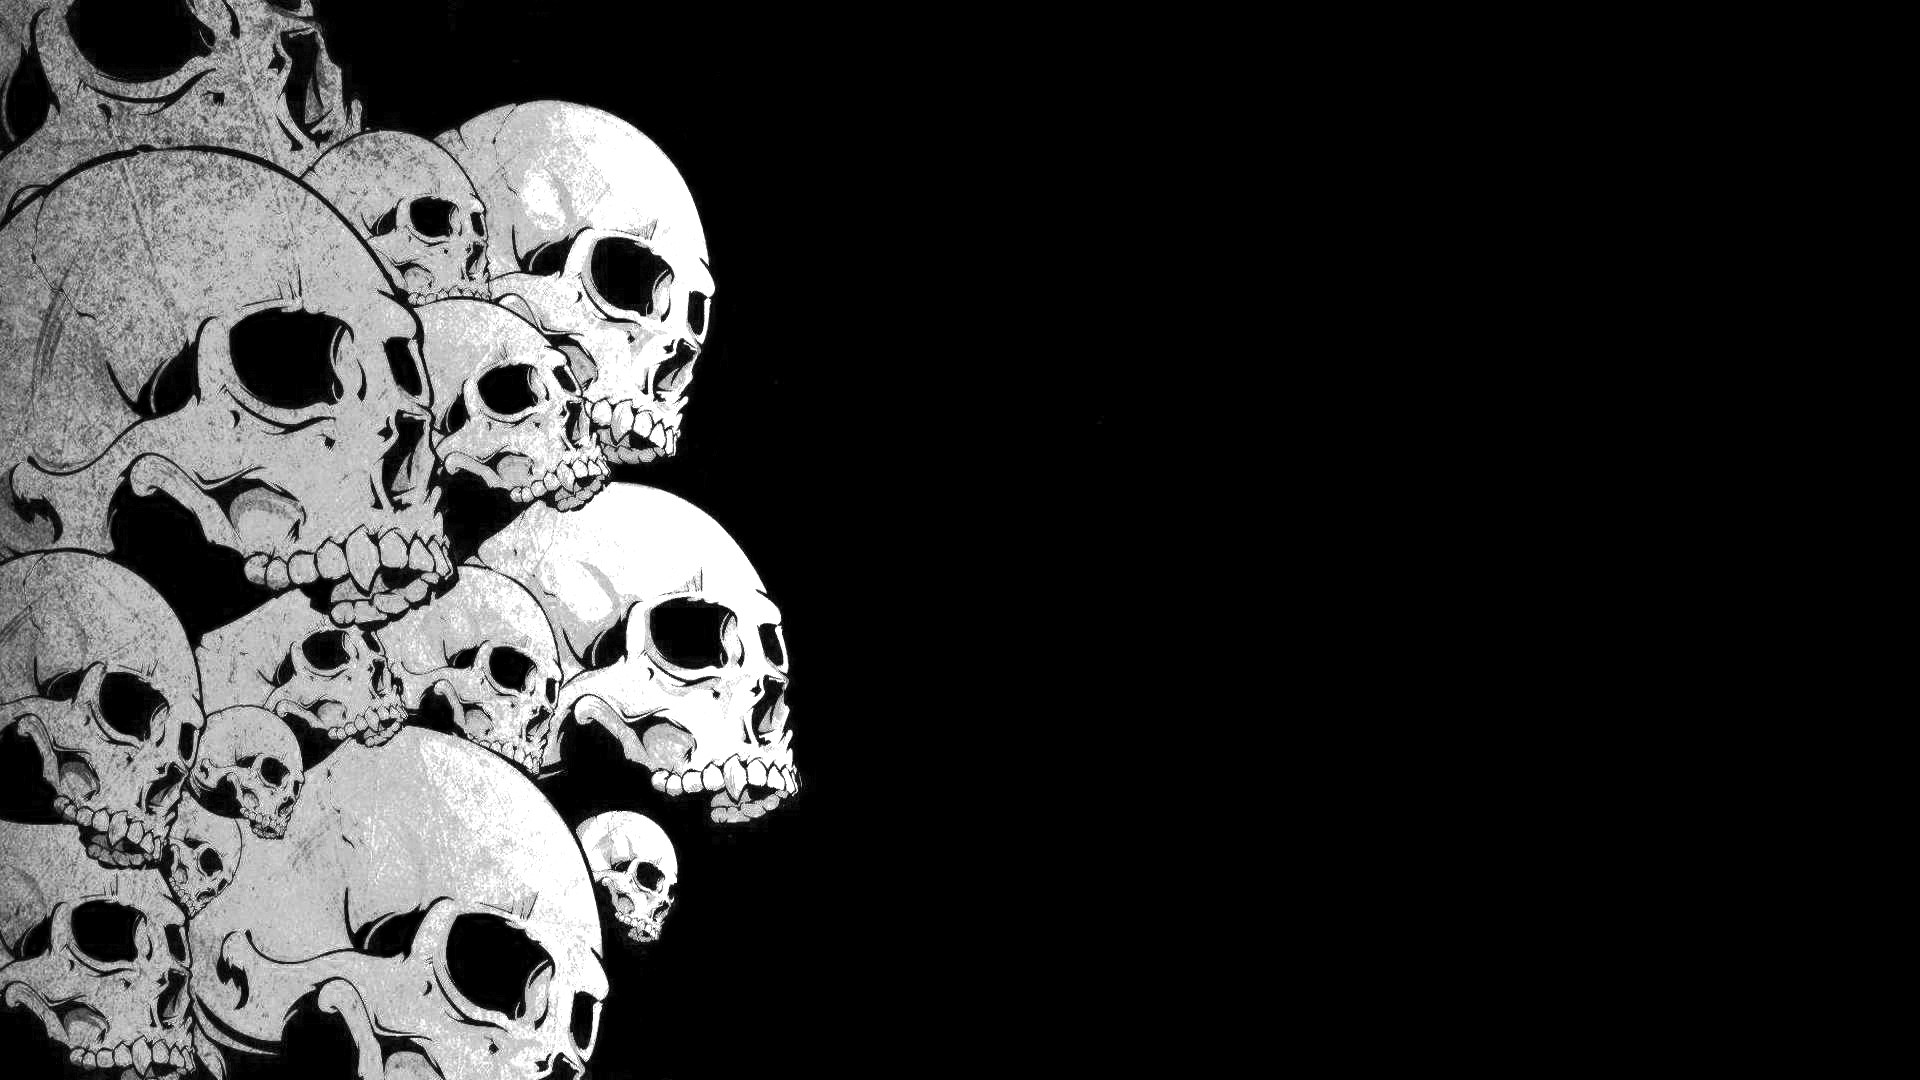 HD Skull Wallpapers 1080p : Find best latest HD Skull Wallpapers 1080p for  your PC desktop background & mobile phones. | hd wallpaper | Pinterest |  Skull …